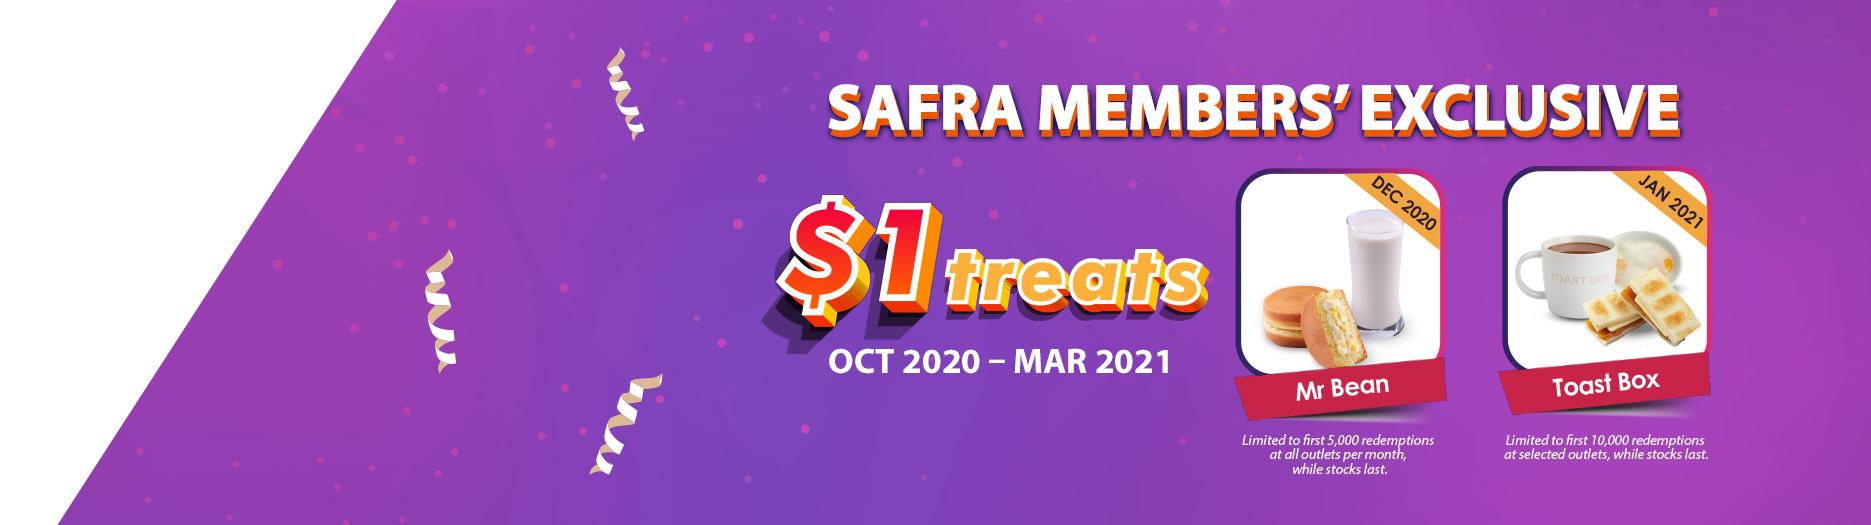 1871x525 monthly treats Jan 21